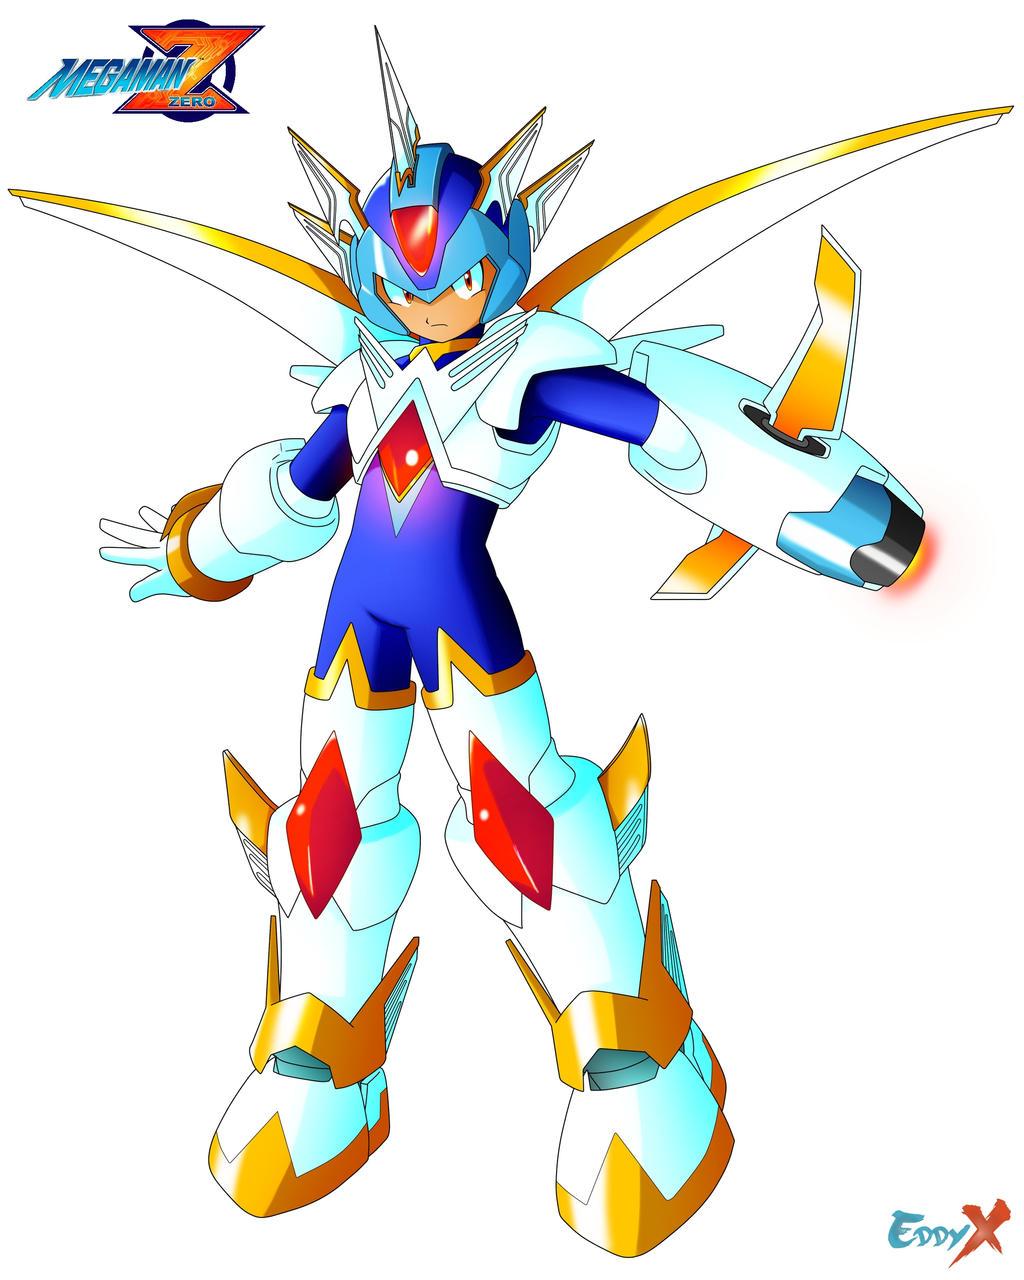 Megaman Zero Copy X 2 Form By Ieddy Xi On Deviantart